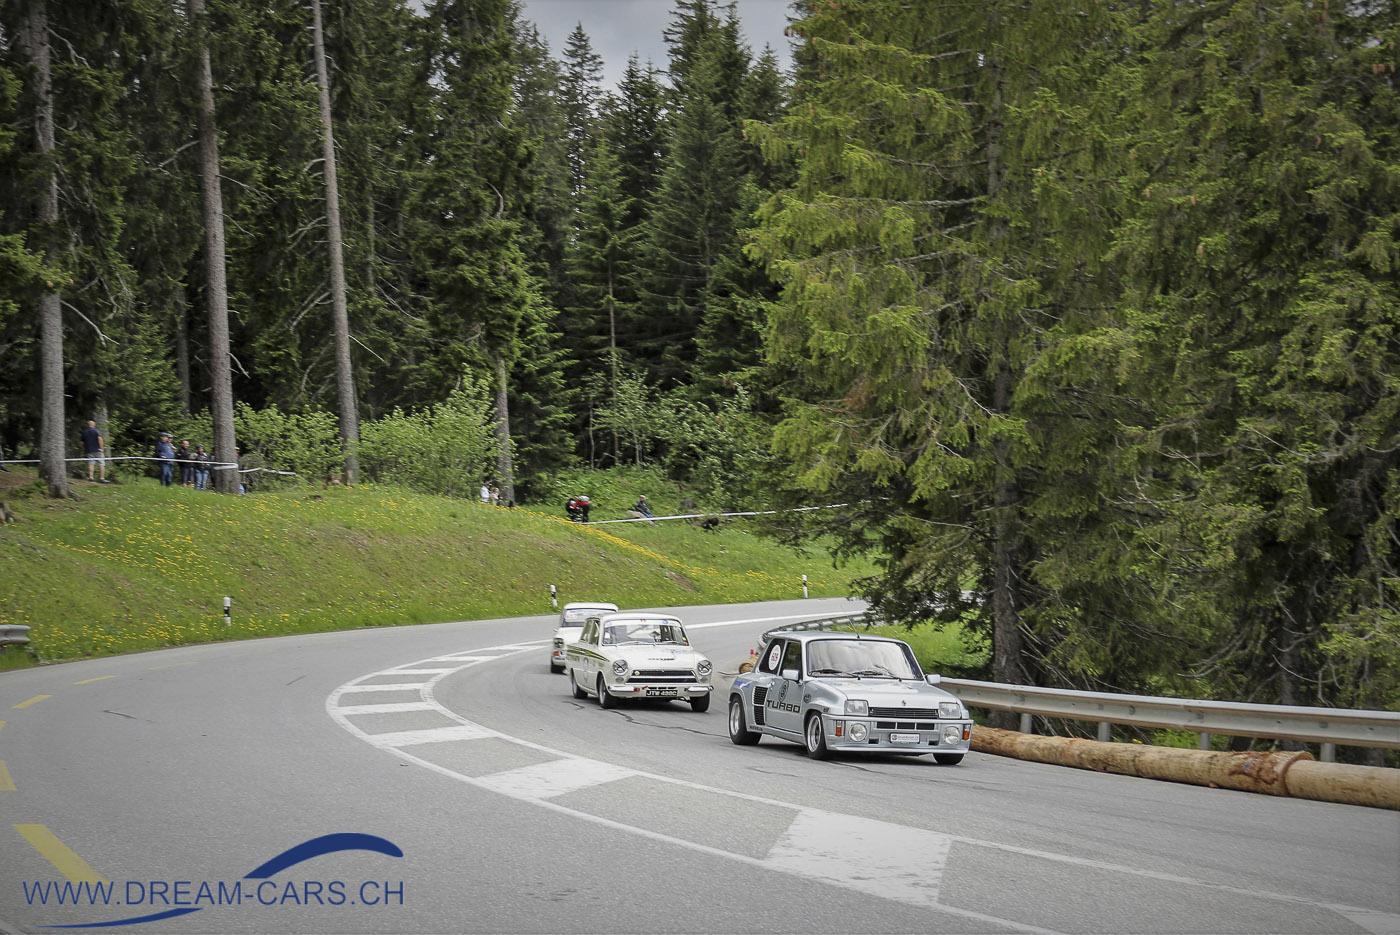 Lenzerheide Motor Classics, 14. bis 16. Juni 2019, Anfahrt zur Kurve bei der Rothornbahn